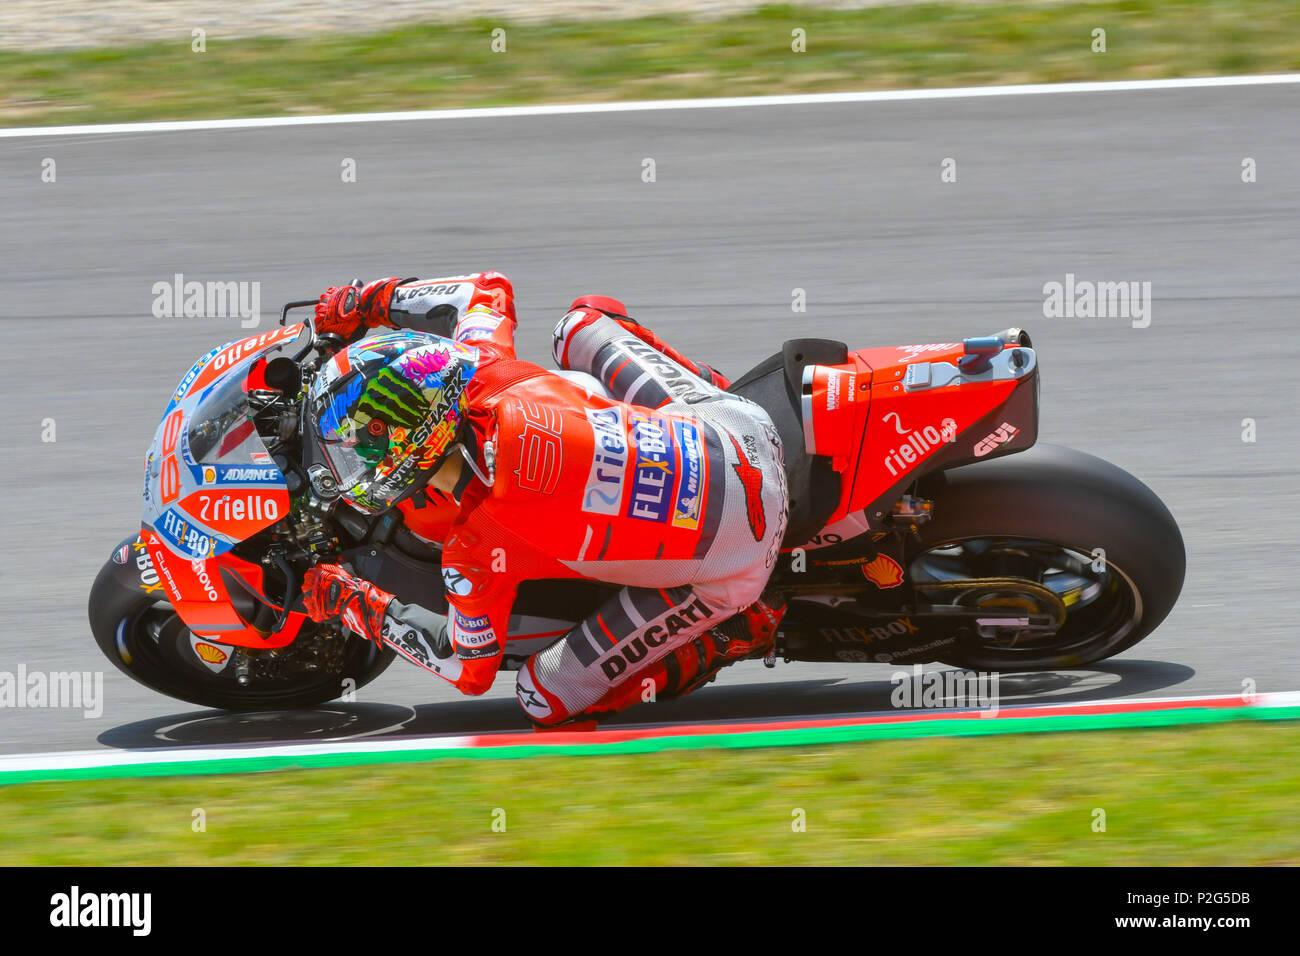 JORGE LORENZO 99 Of Spain During The Second MotoGP Free Practice Session Race Catalunya Grand Prix At Circuit De Barcelona Racetrack In